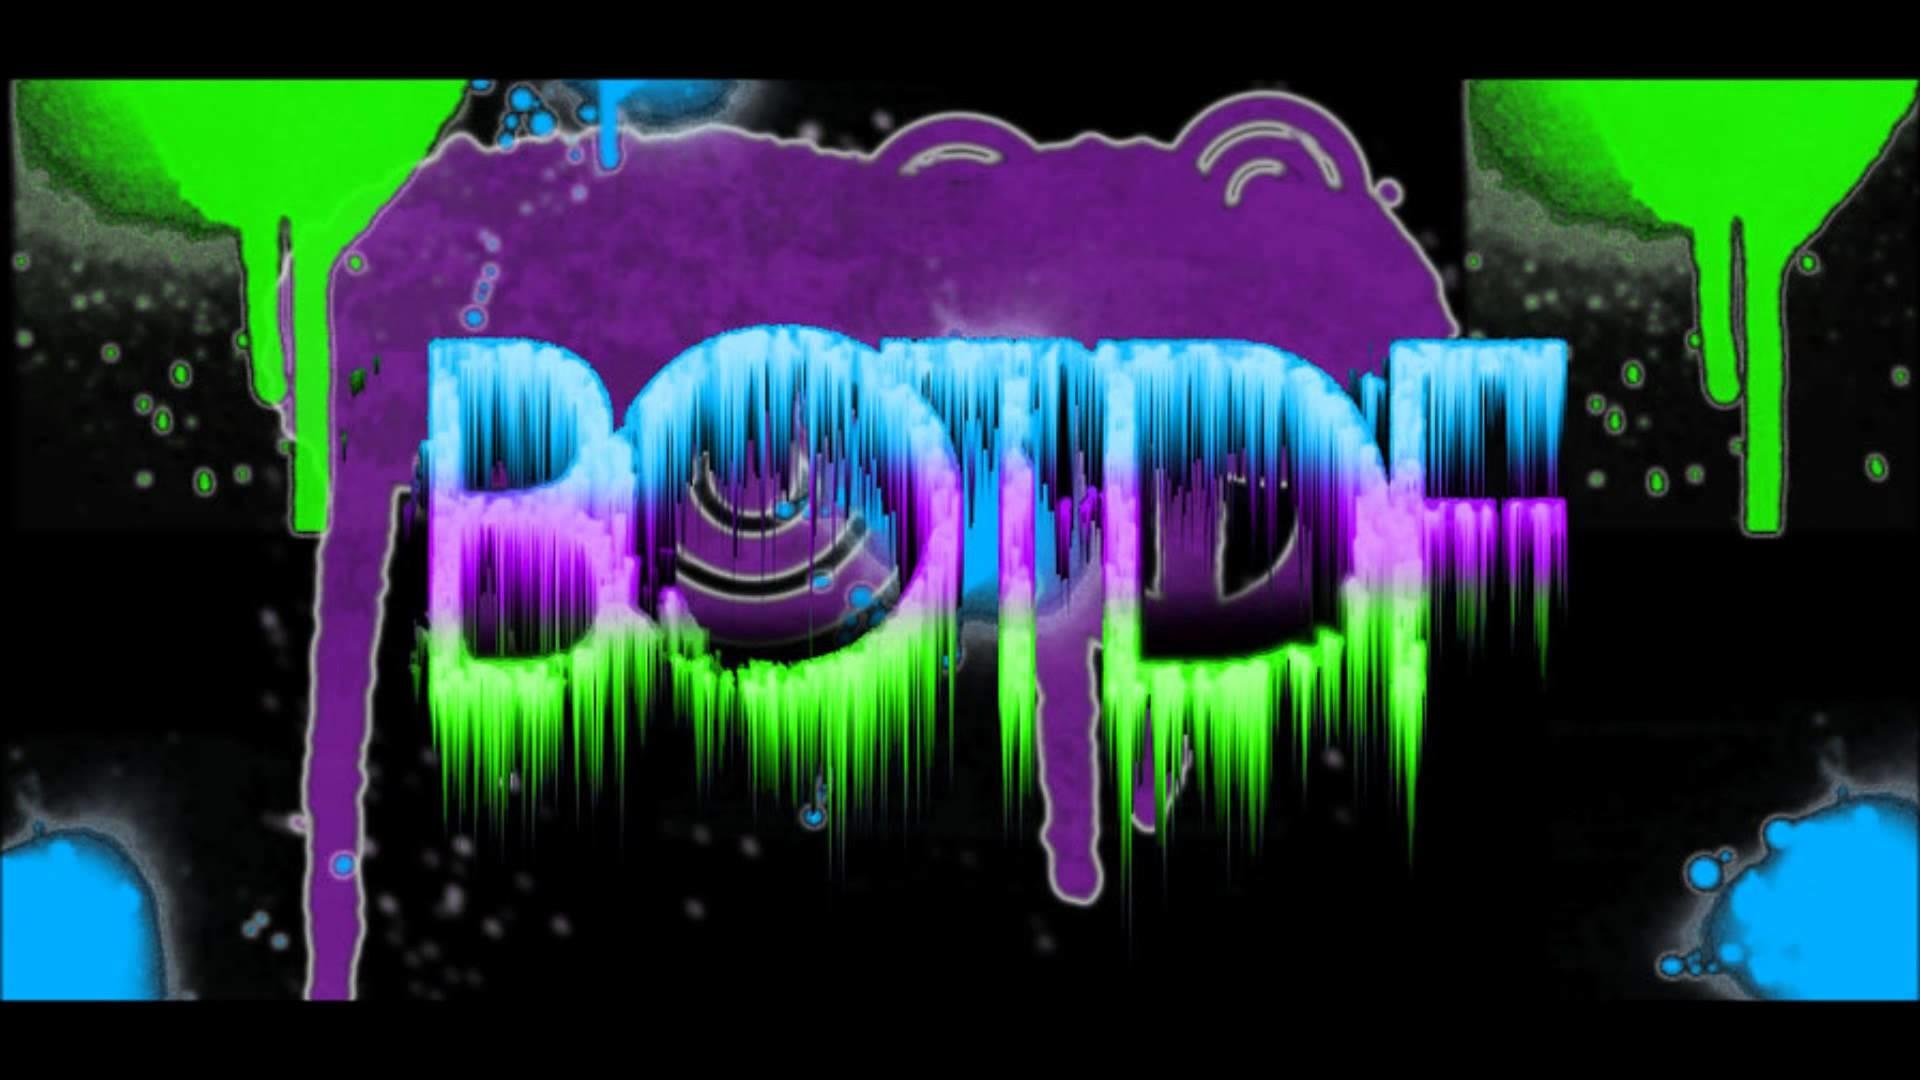 Botdf wallpaper 67 images 1920x1080 blood on the dance floor wallpaper voltagebd Choice Image